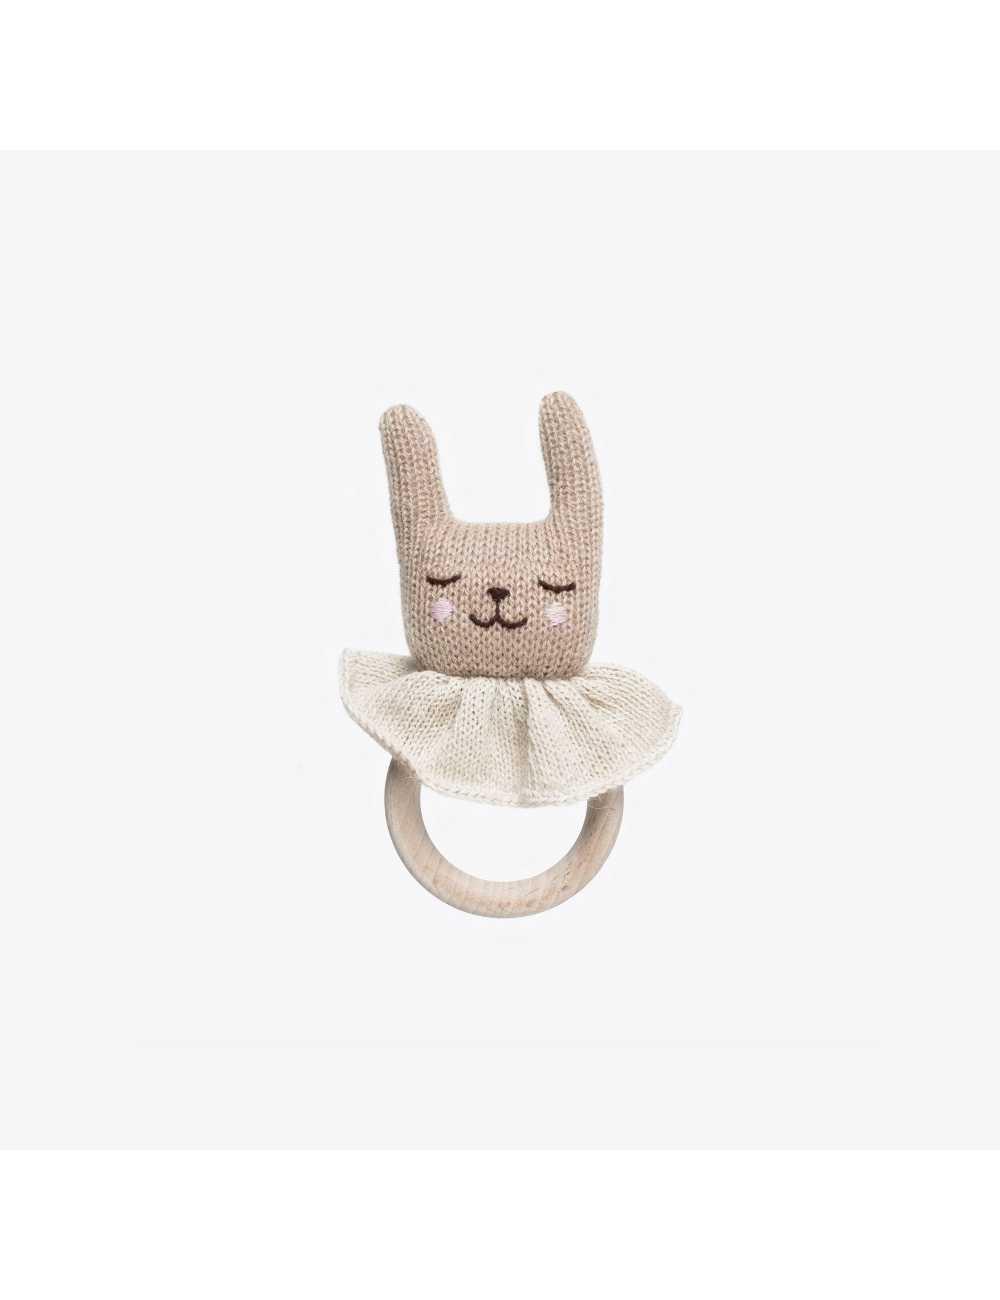 Teething ring   Rabbittest